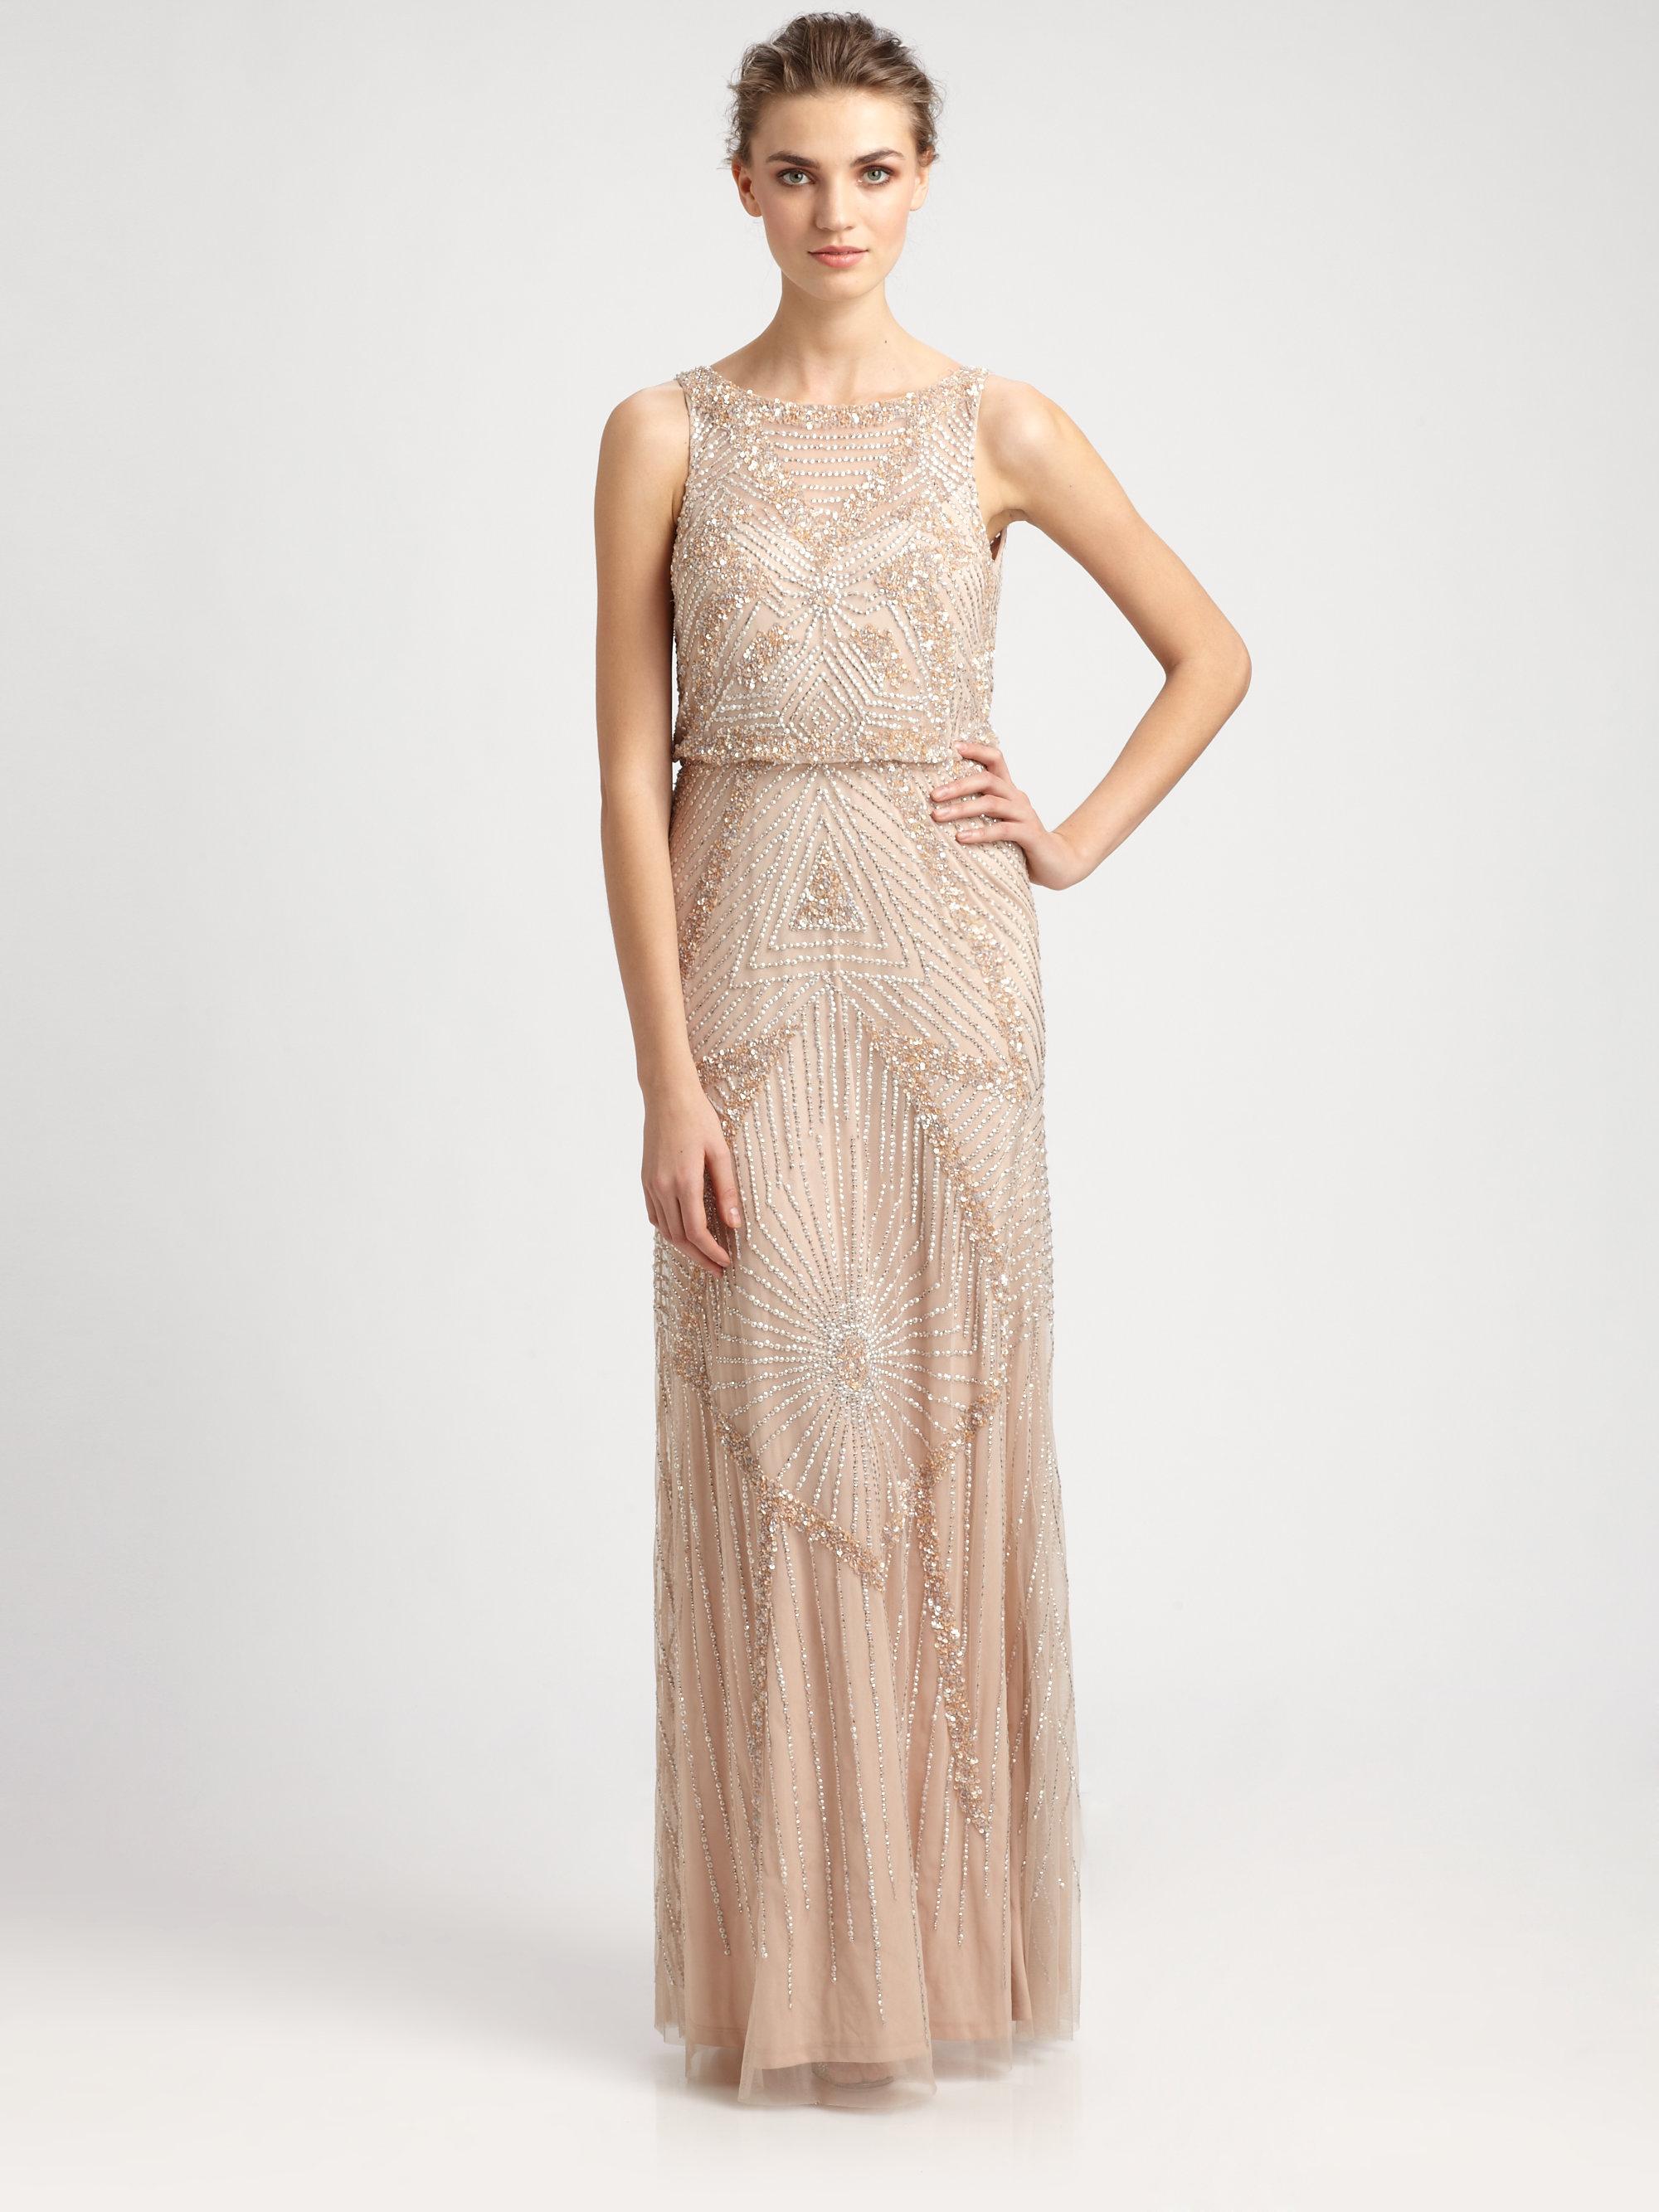 Lyst - Aidan Mattox Beaded Blouson Gown in Pink